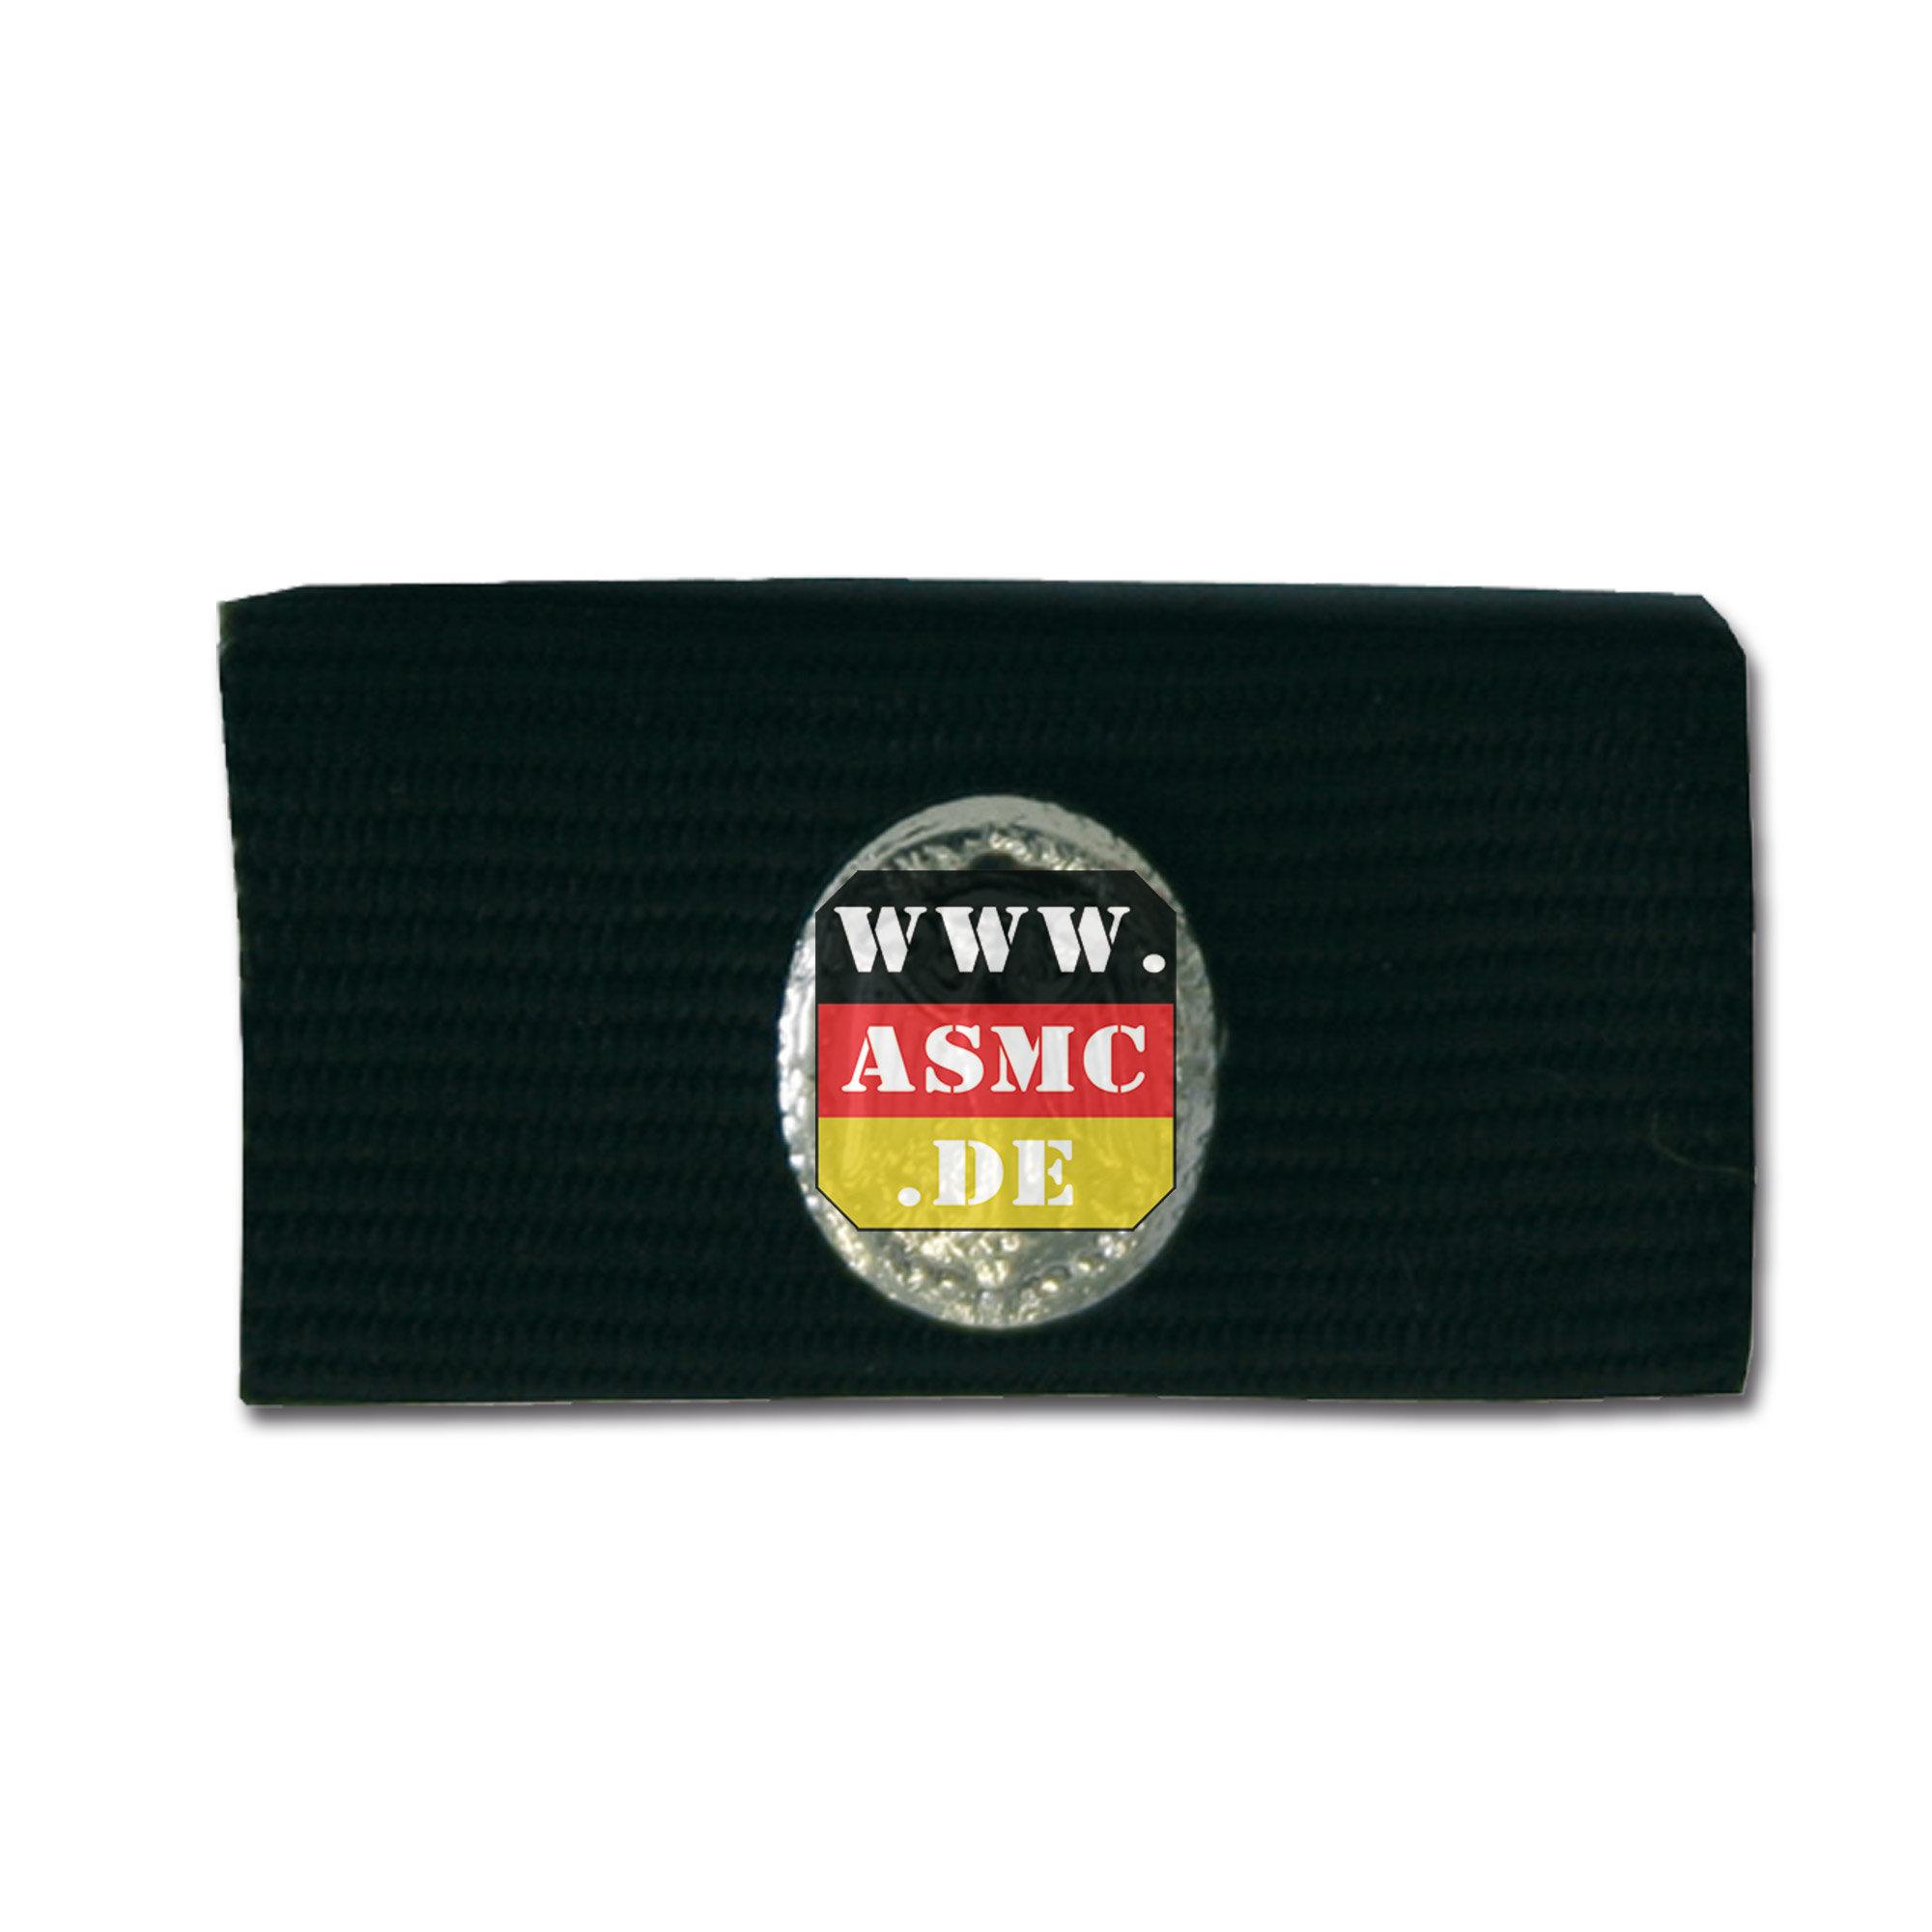 Service ribbon Achievement badge silver/ black